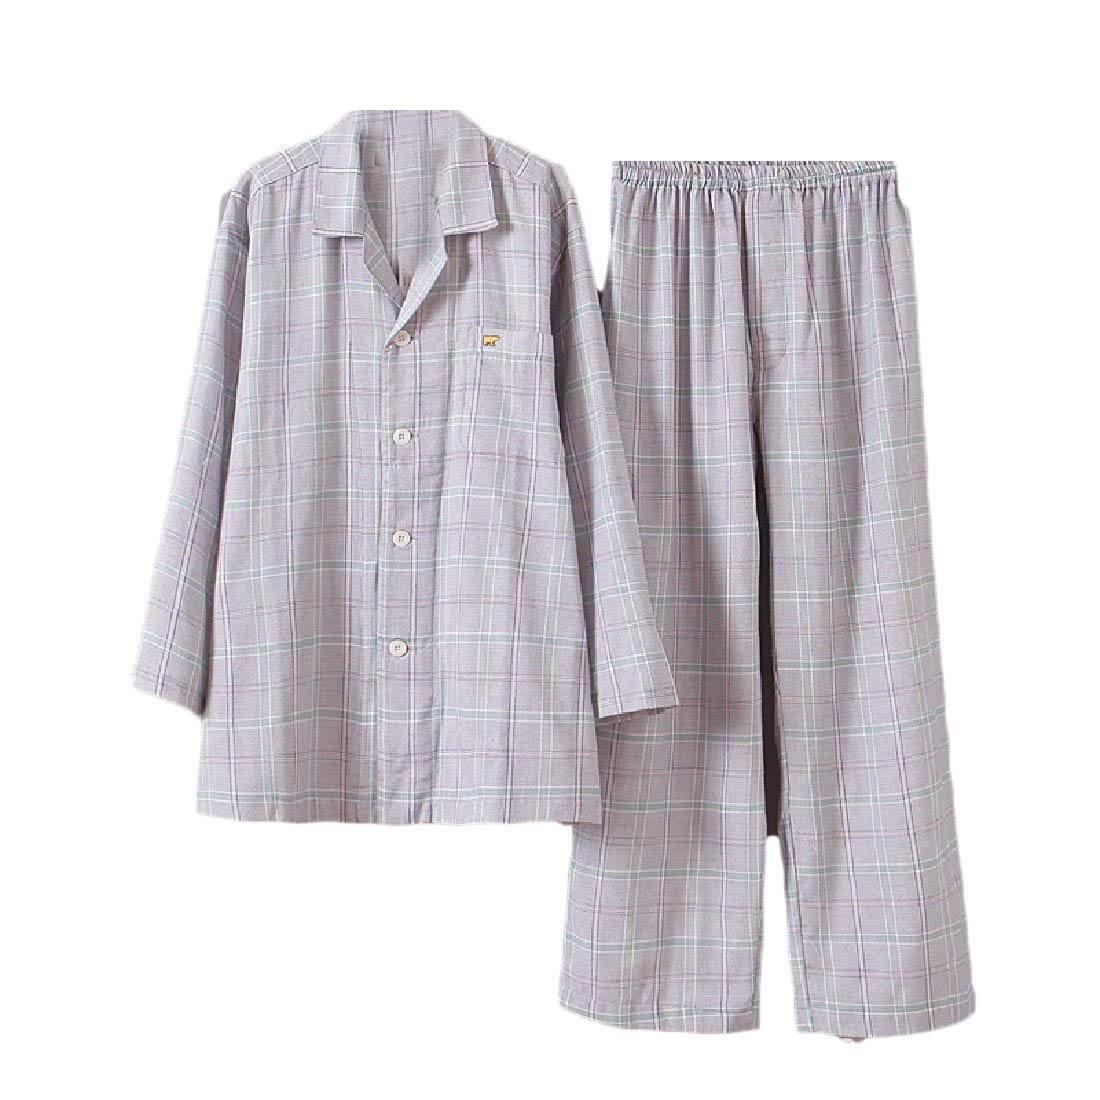 Winwinus Mens Double Layers Classic Plaid Cotton Top with Pants Pajama Sleep Set